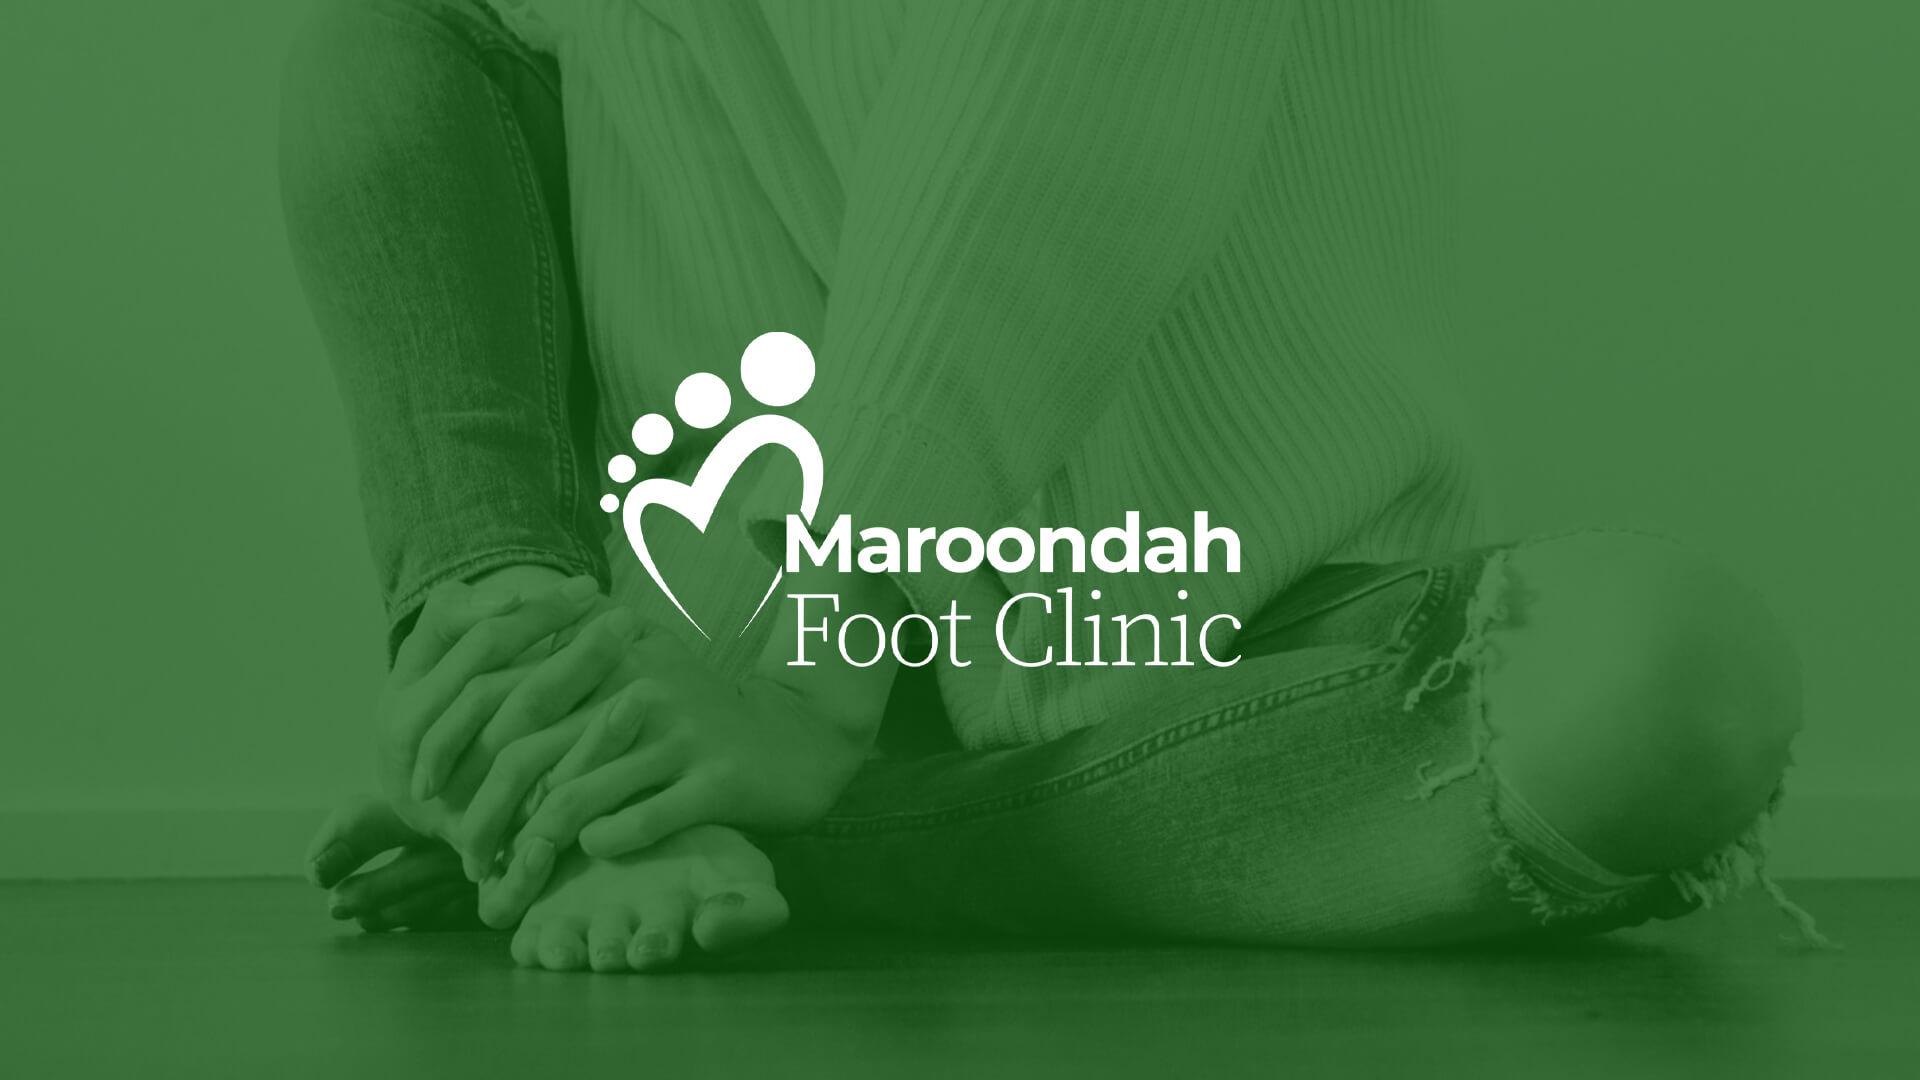 Maroondah Foot Clinic Banner | Voltekka: Website Design & Digital Marketing Specialists